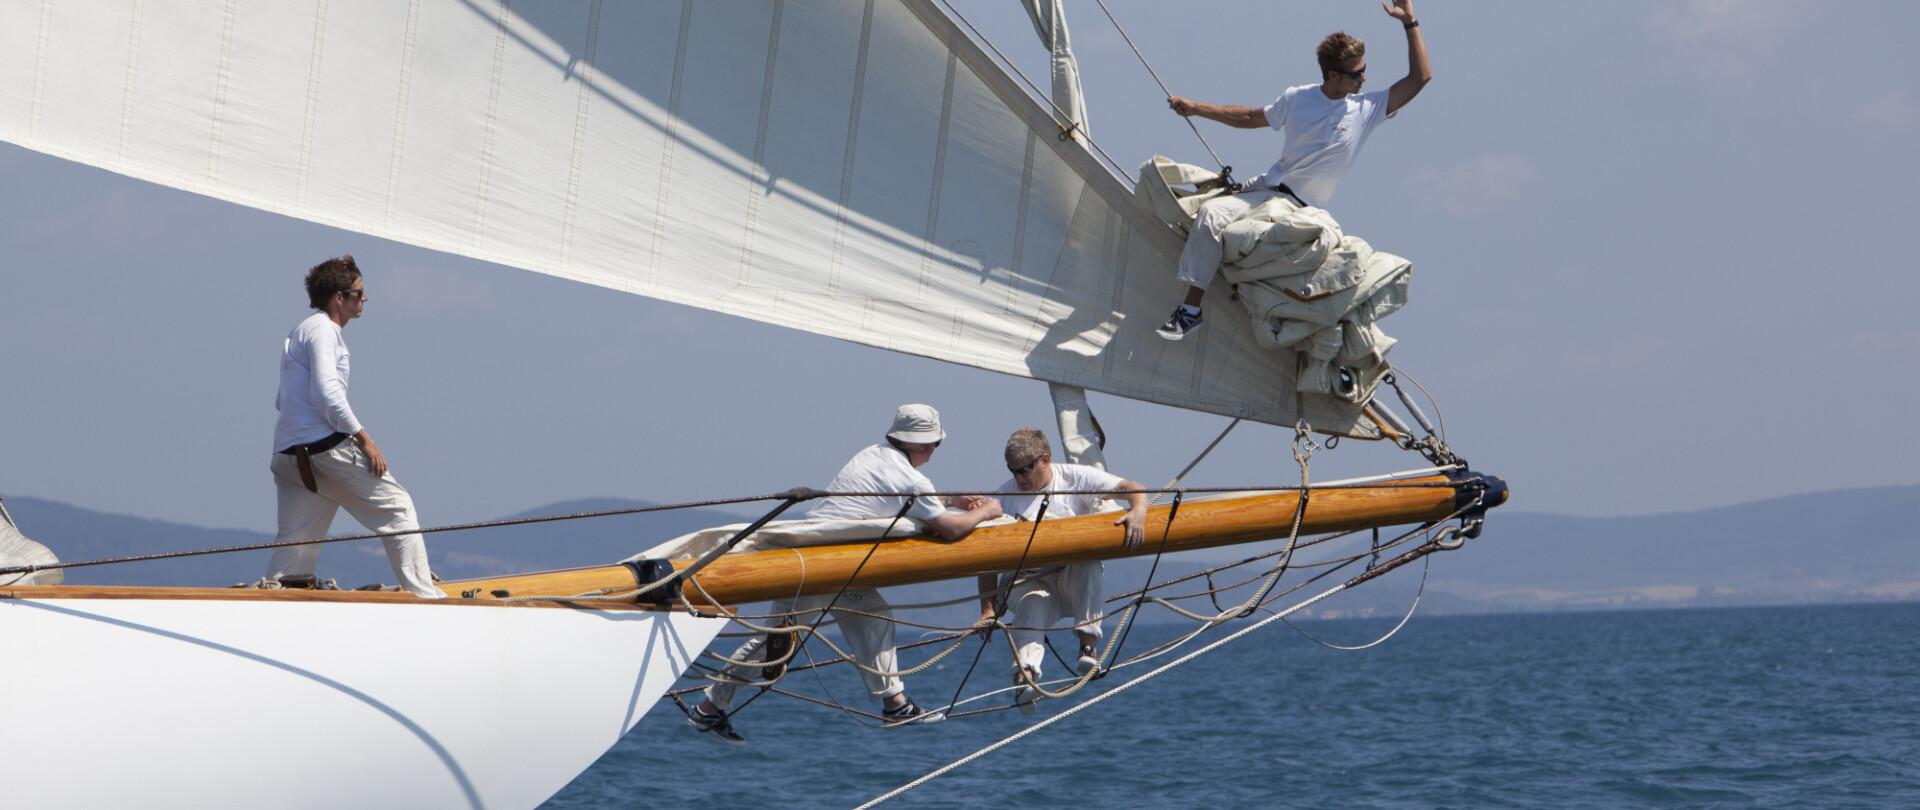 Edmiston Fleet Attend Regattas on the French Riviera photo 1